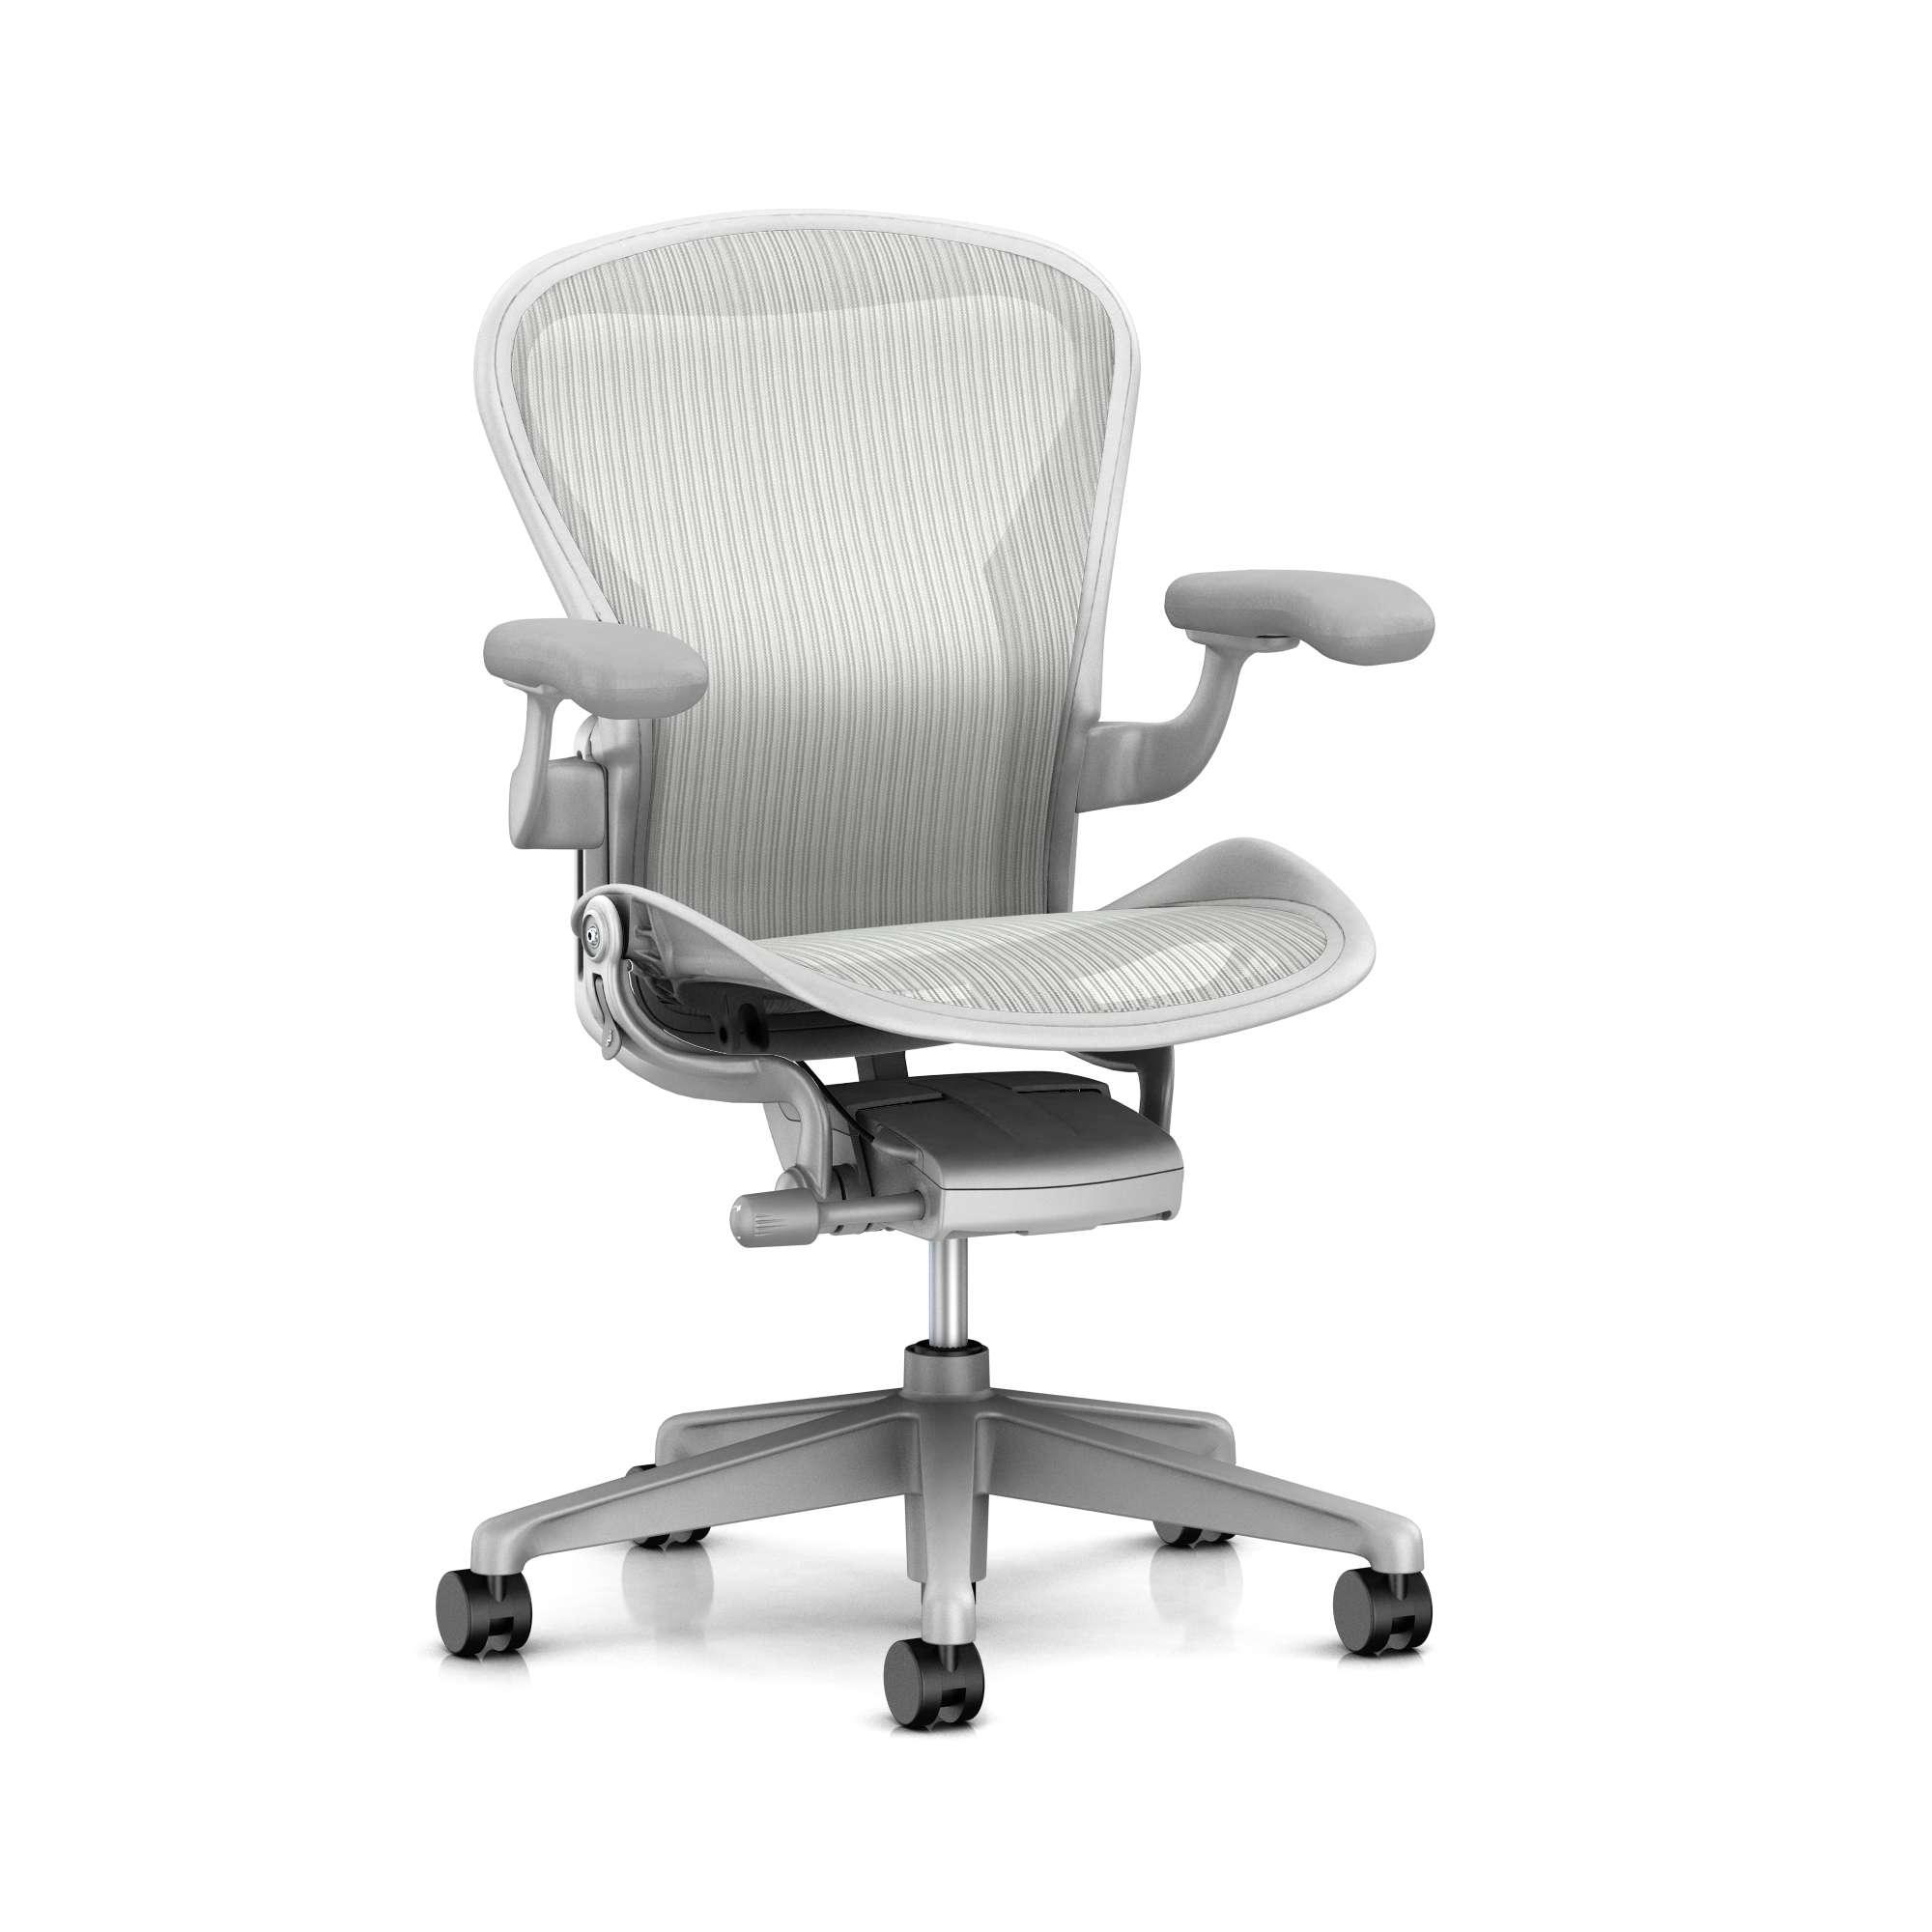 the herman miller aeron chair